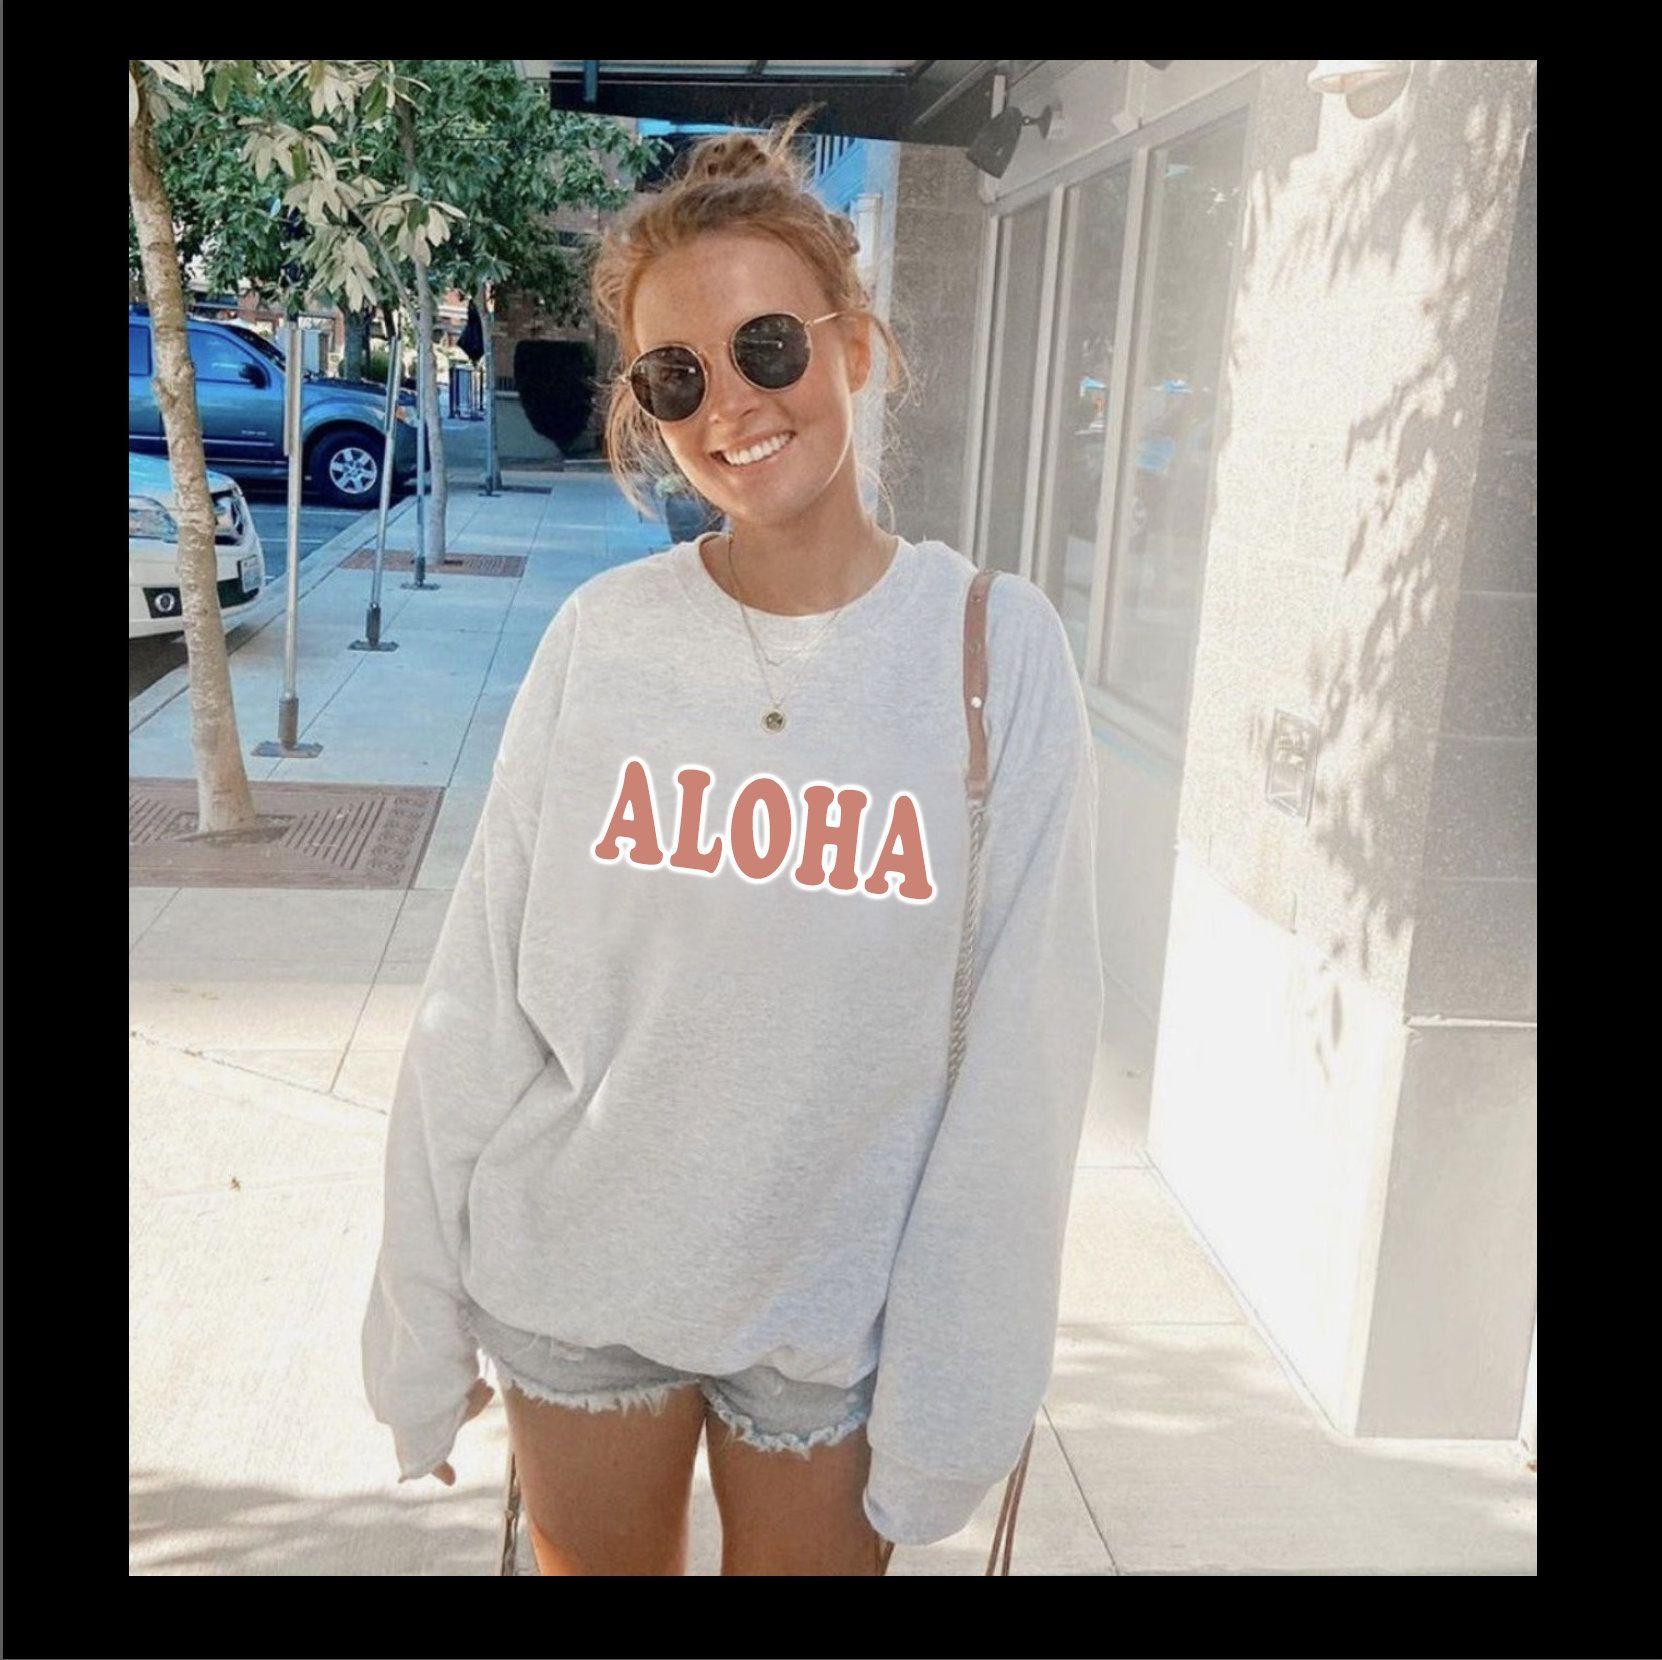 Aloha Sweatshirt Hawaii Unisex Crewneck Sweatshirt Hawaii Sweatshirt Hawaiian Pullover Sweatshirt Womens Oversized Sweatshirts Women Beach T Shirts Sweatshirts [ 1660 x 1662 Pixel ]